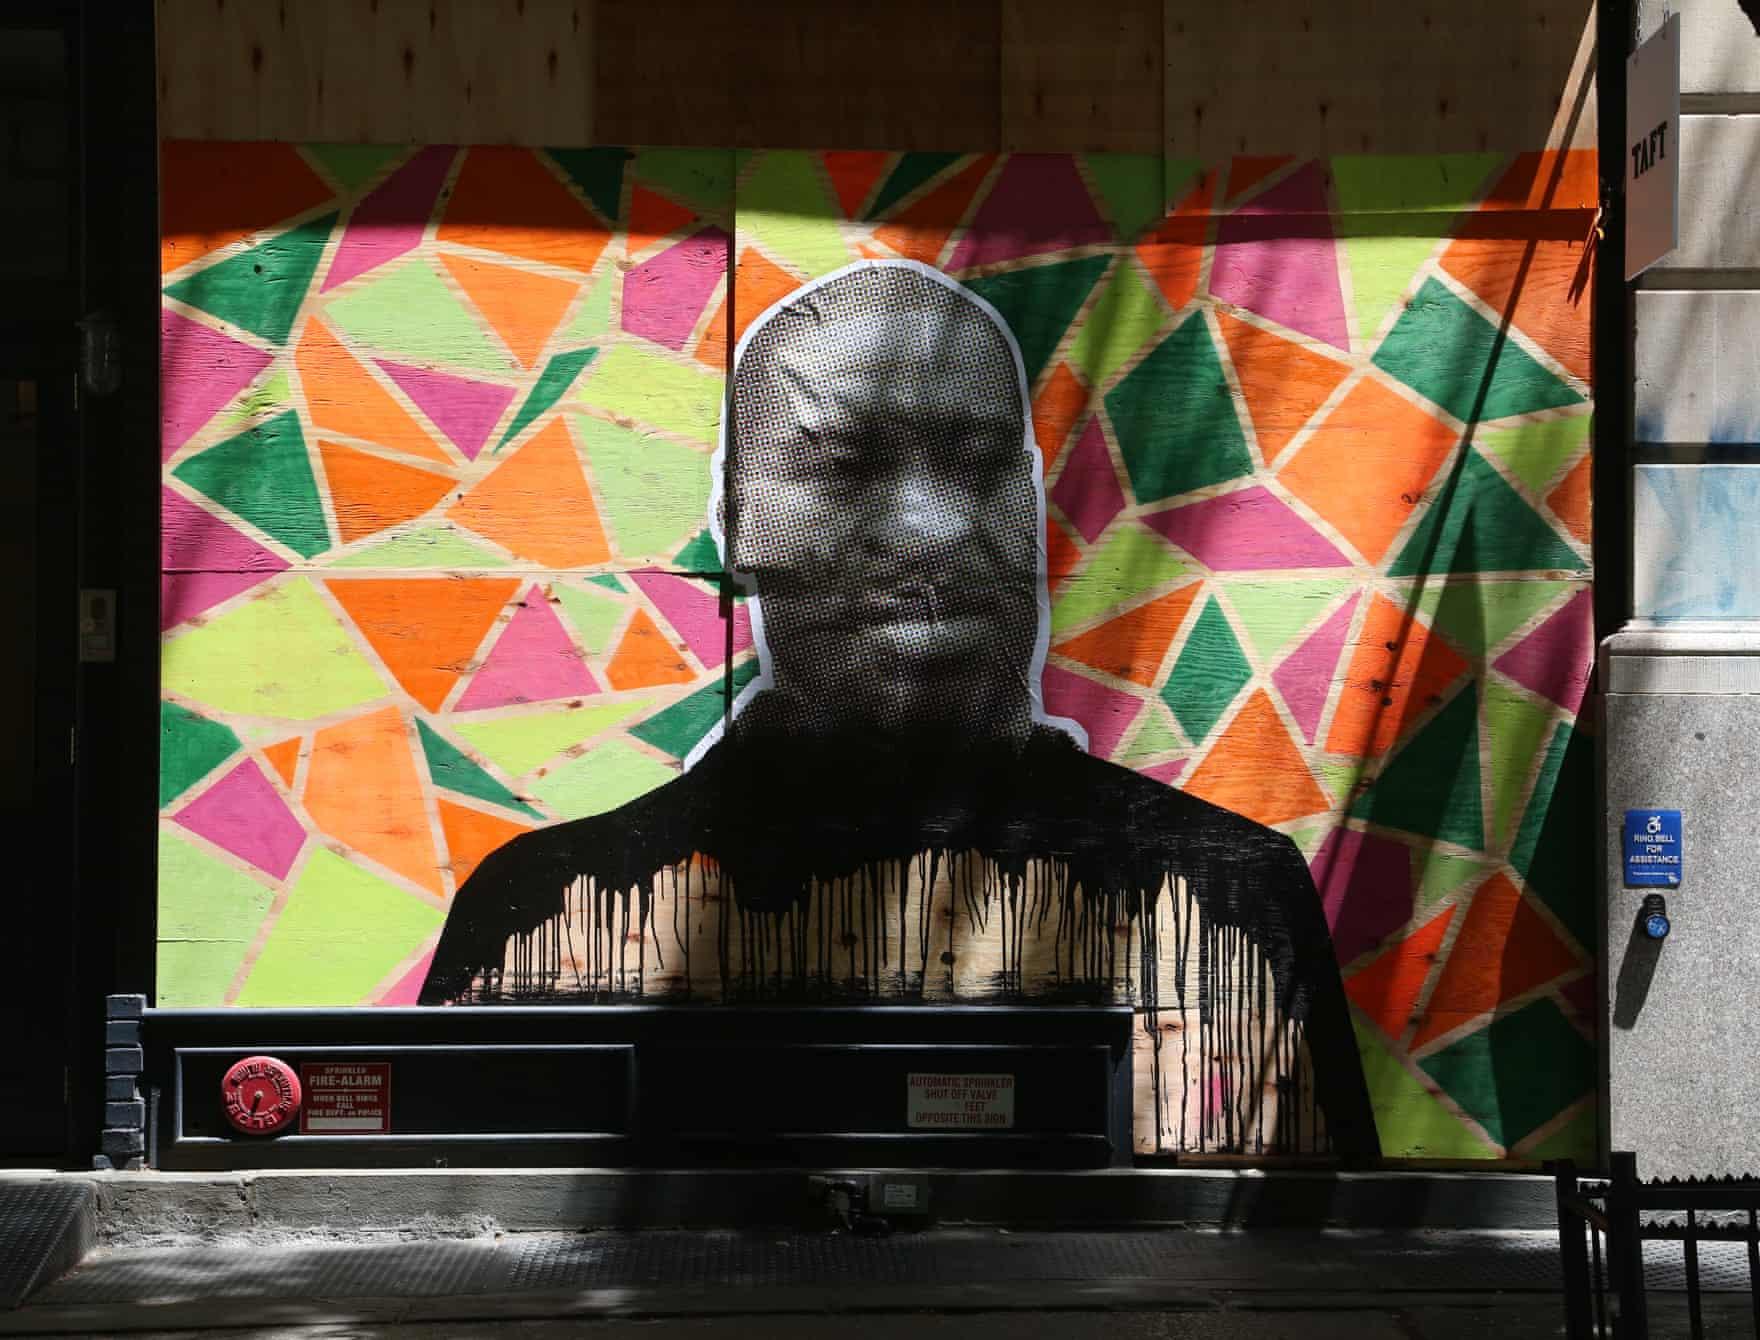 New York Graffiti Blacklivesmatter3